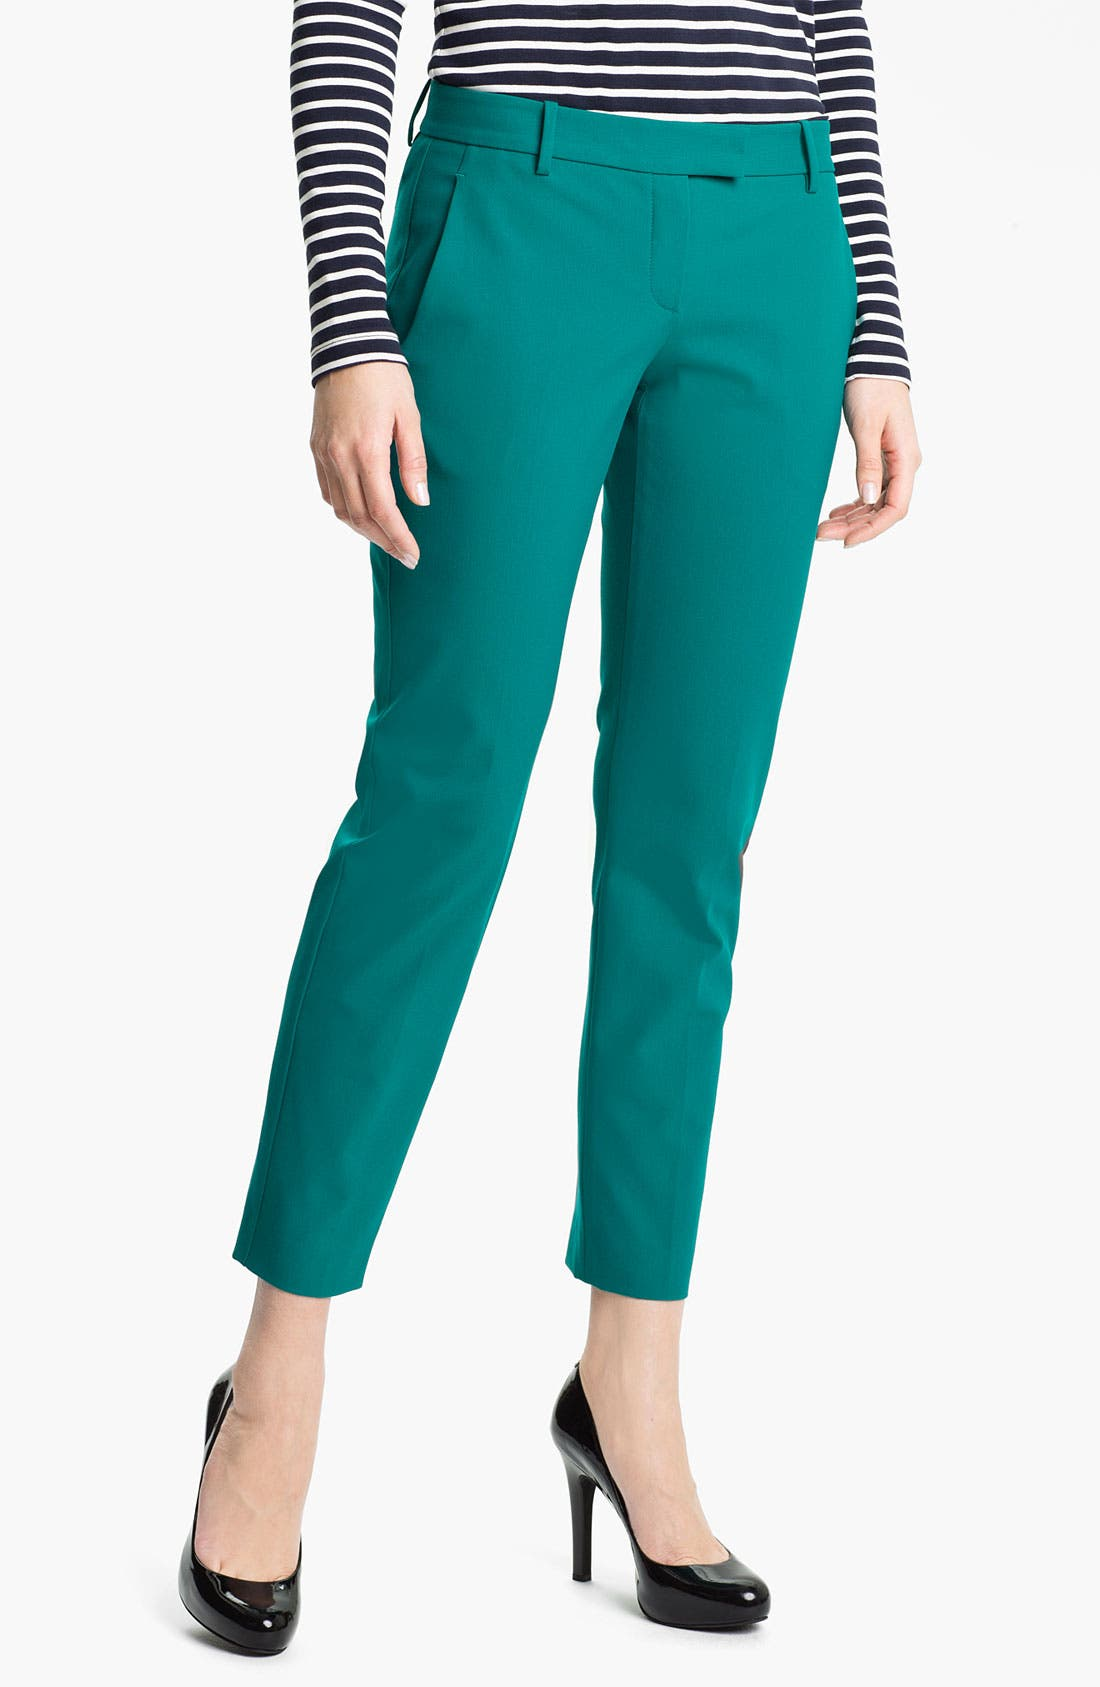 Main Image - Theory 'Sienna' Crop Pants